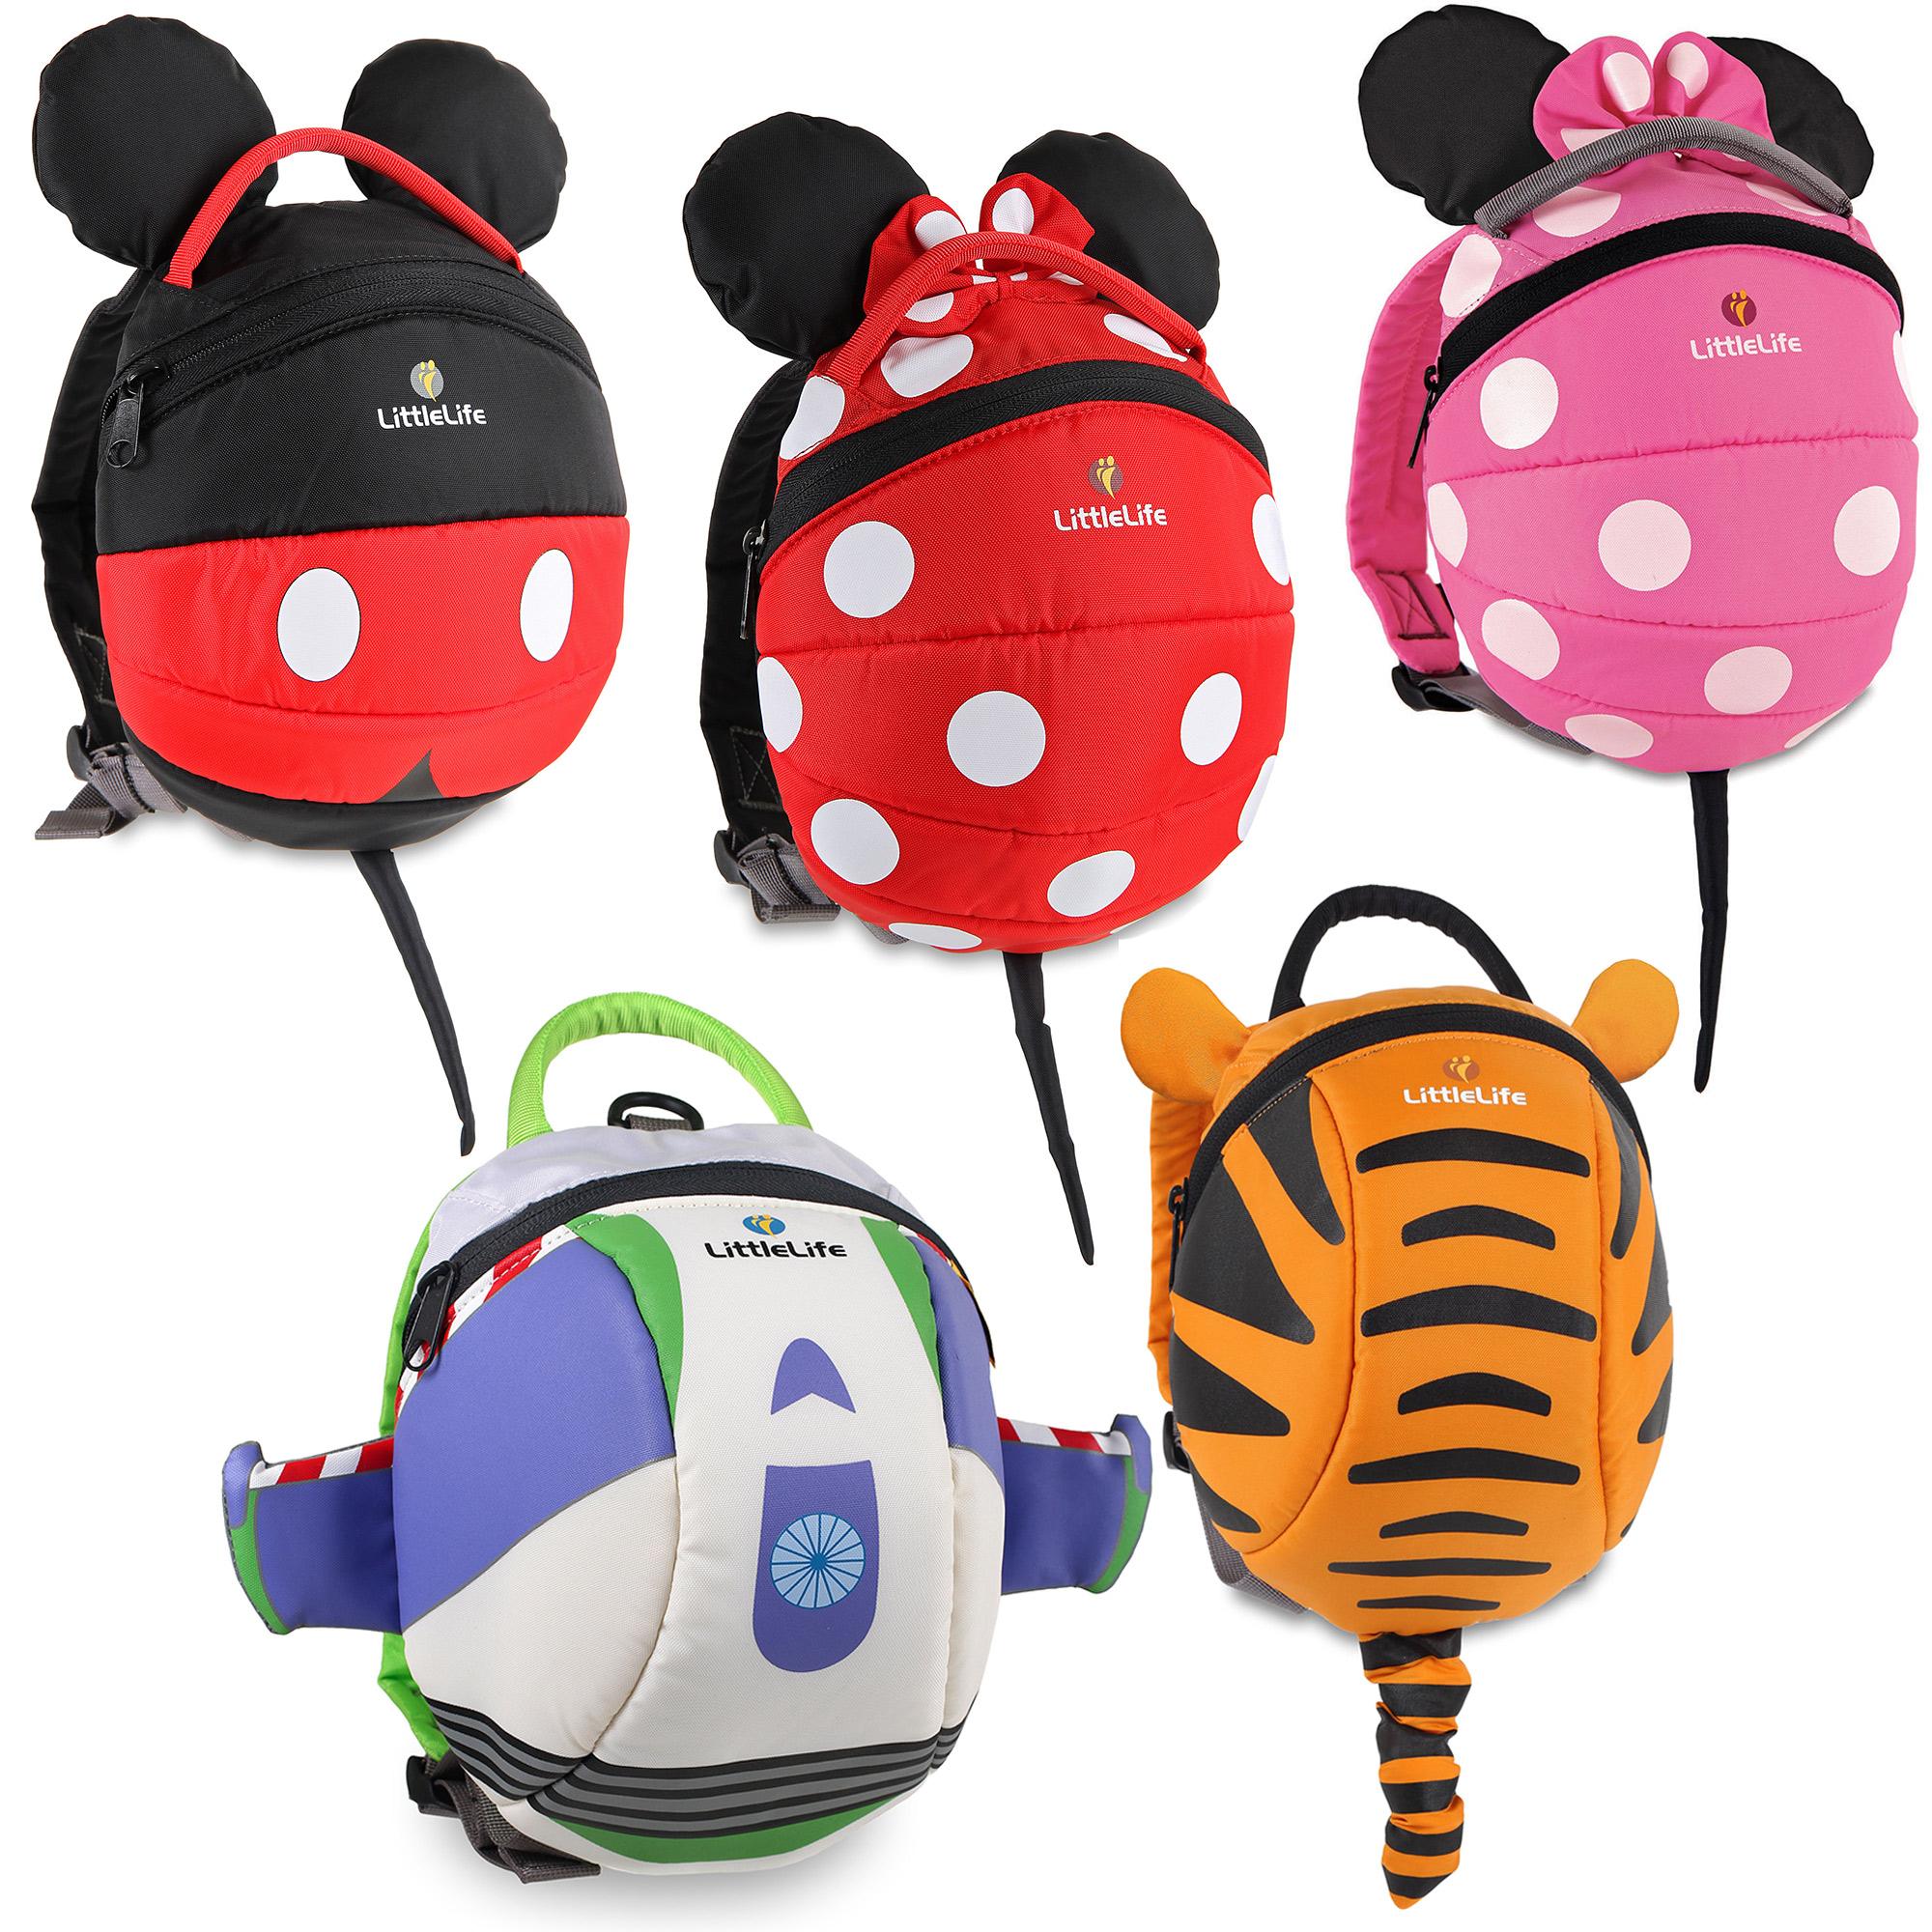 LittleLife DISNEY DAYSACK WITH REIN Baby Toddler Child Backpack